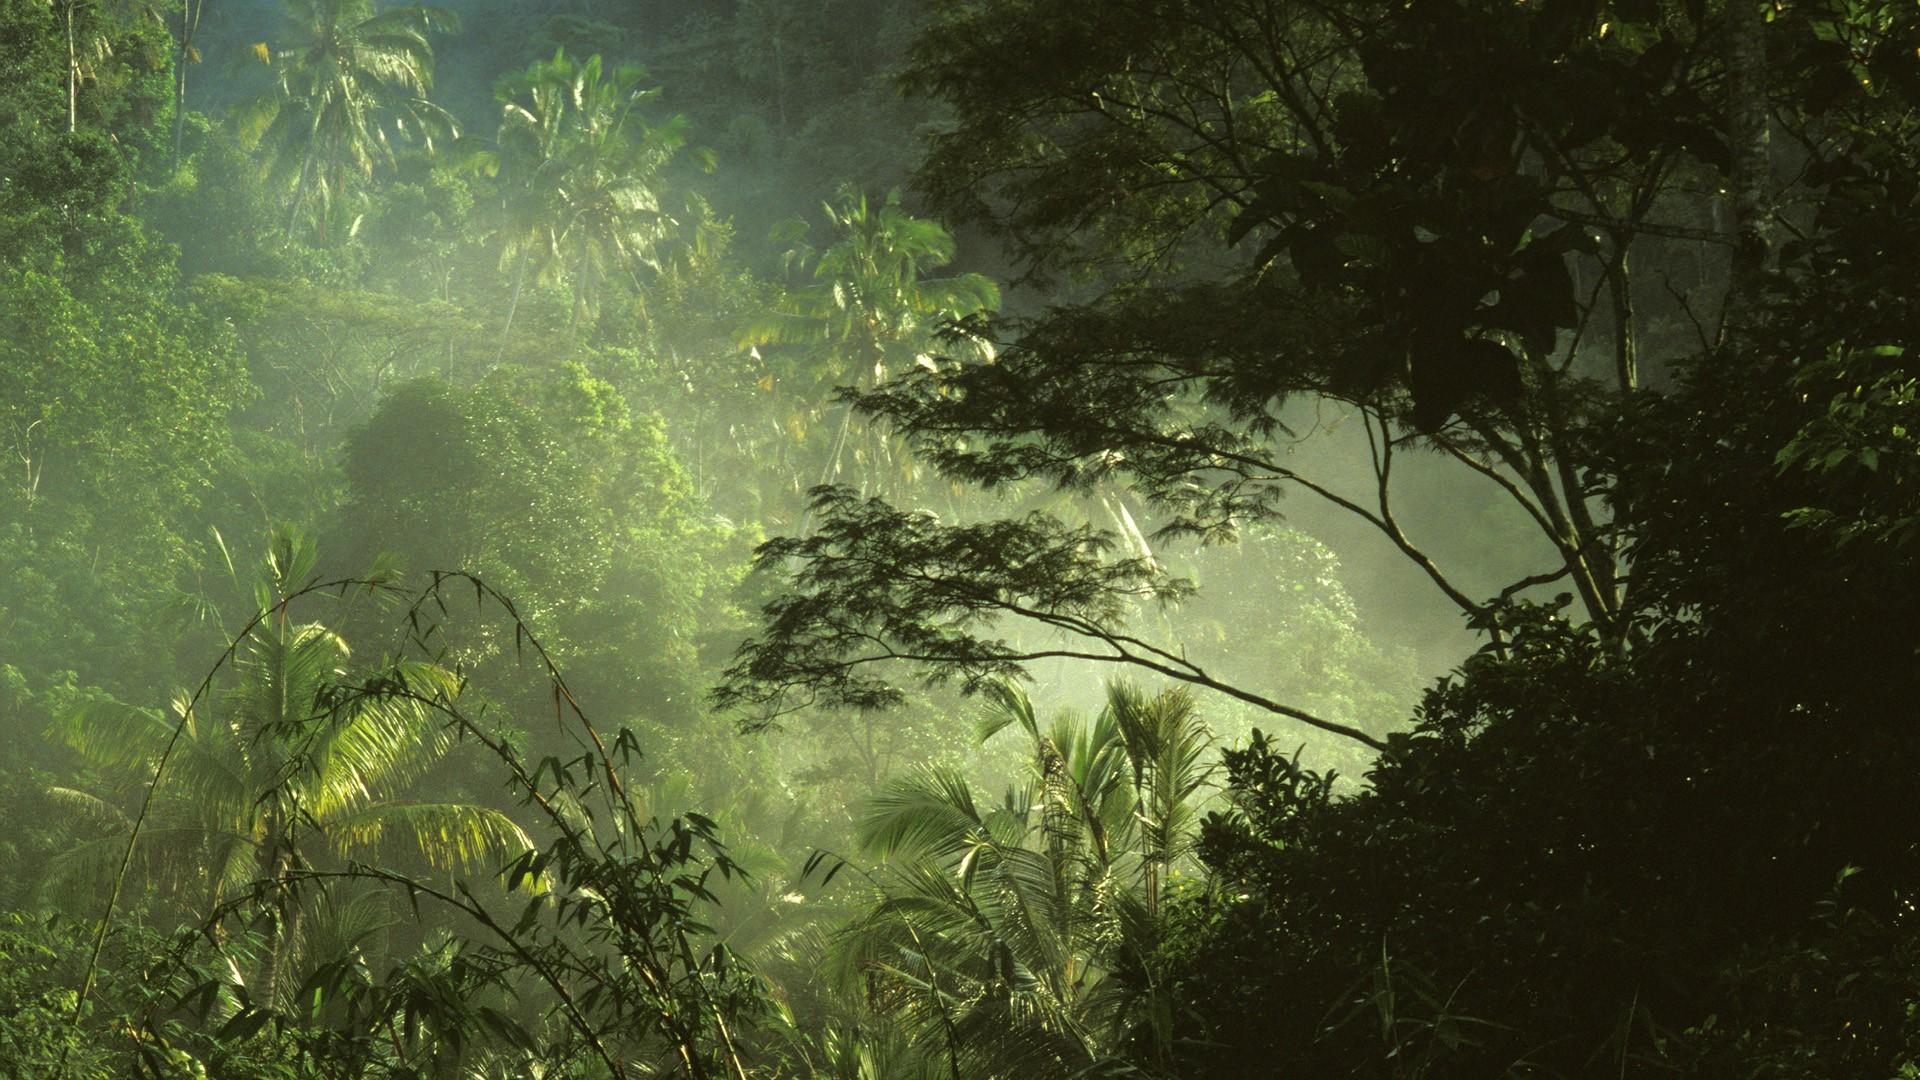 Tropical Rainforest Wallpaper 58 Pictures